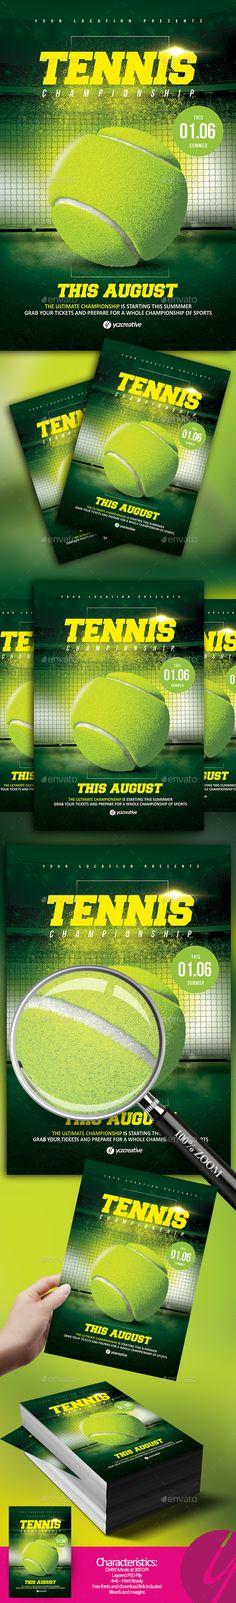 17 Best Tennis Classes Flyer images Sports flyer, Tennis, Event flyers